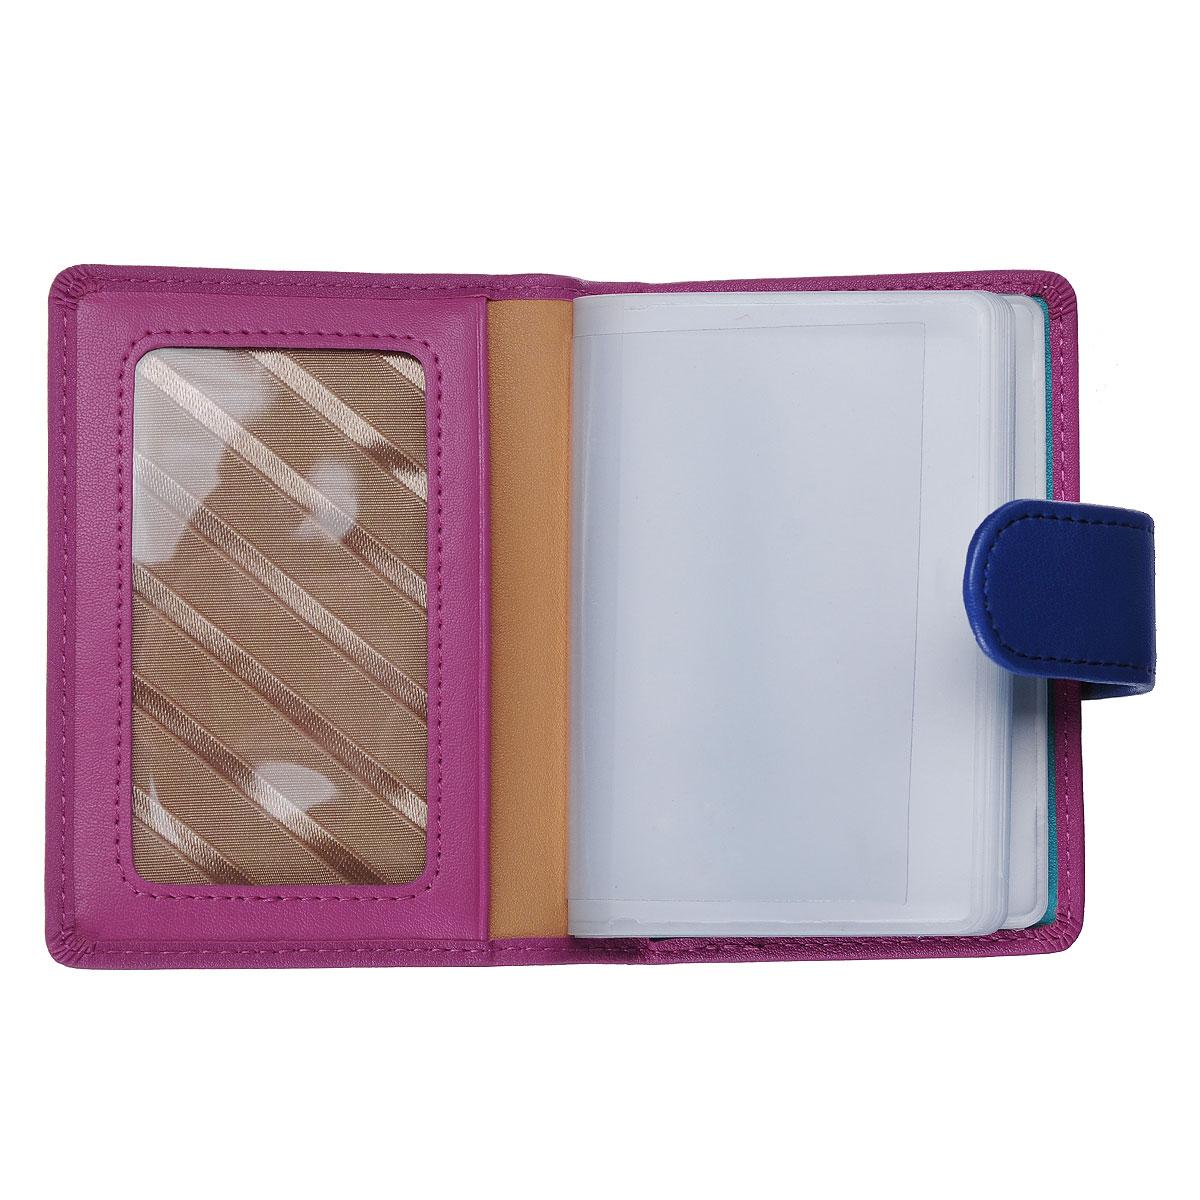 Визитница Leighton, цвет: розовый, синий. 22108-1918/6 ( 22108-1918/6 фуксия/цветн )